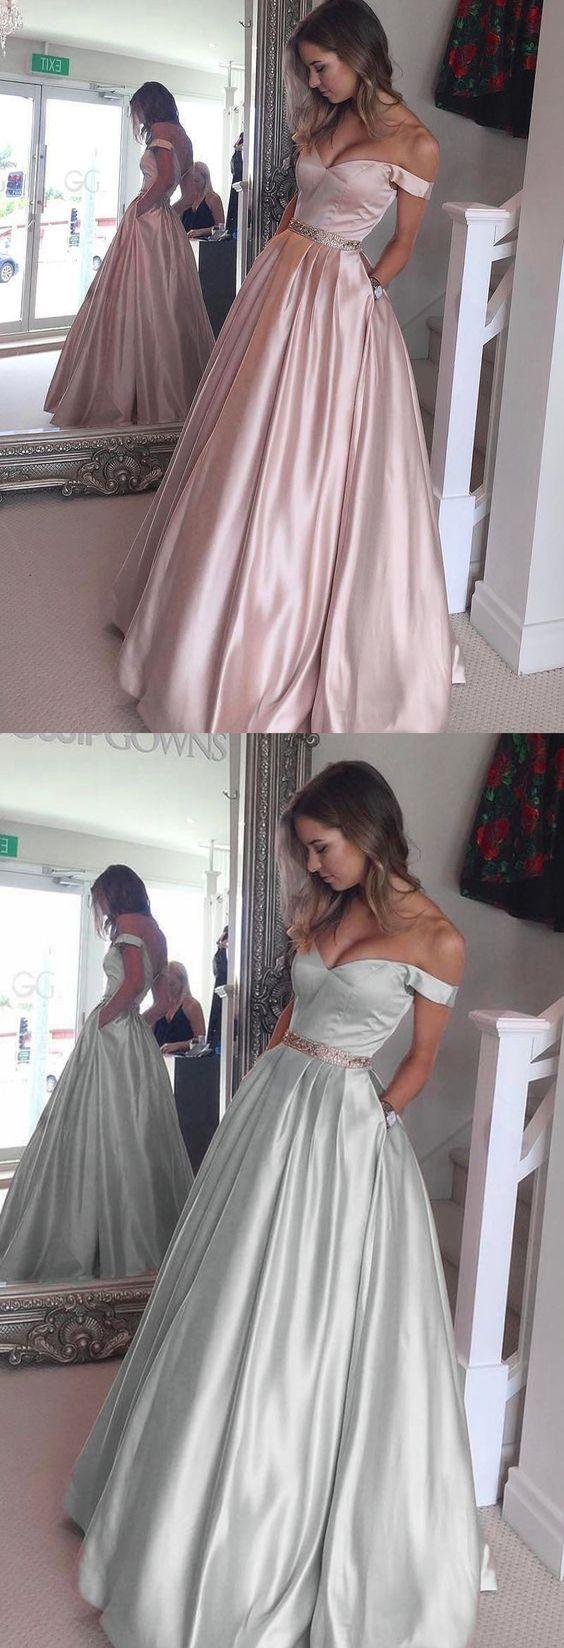 Prom dressesprom dresses longprom dresses prom dresses